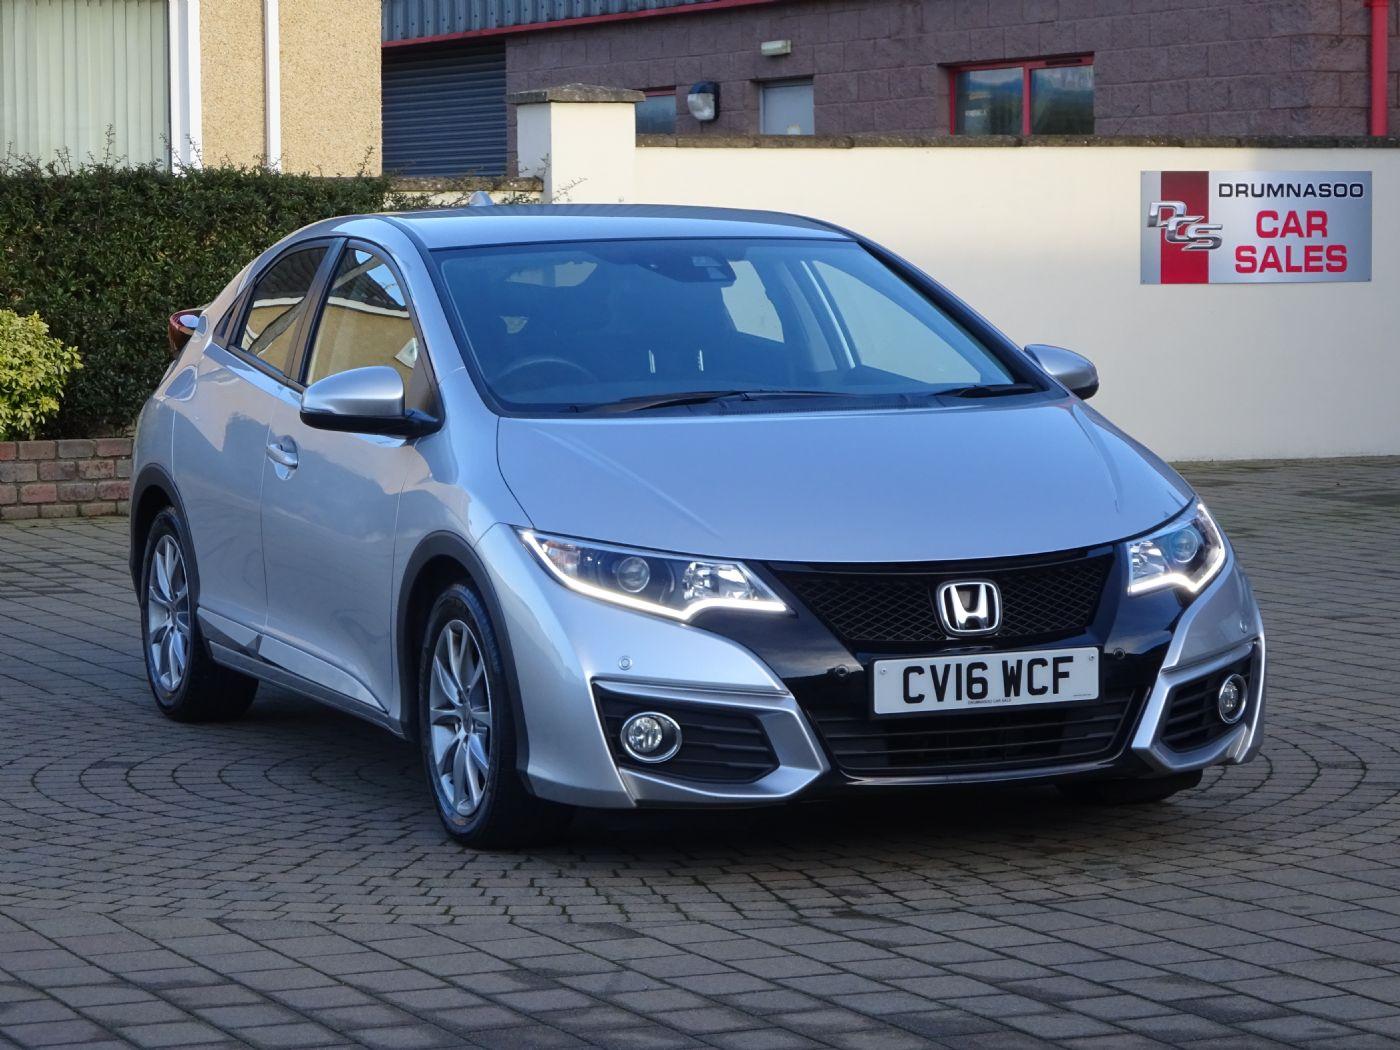 Honda Civic  I-Dtec SE Plus Nav, Rear camera